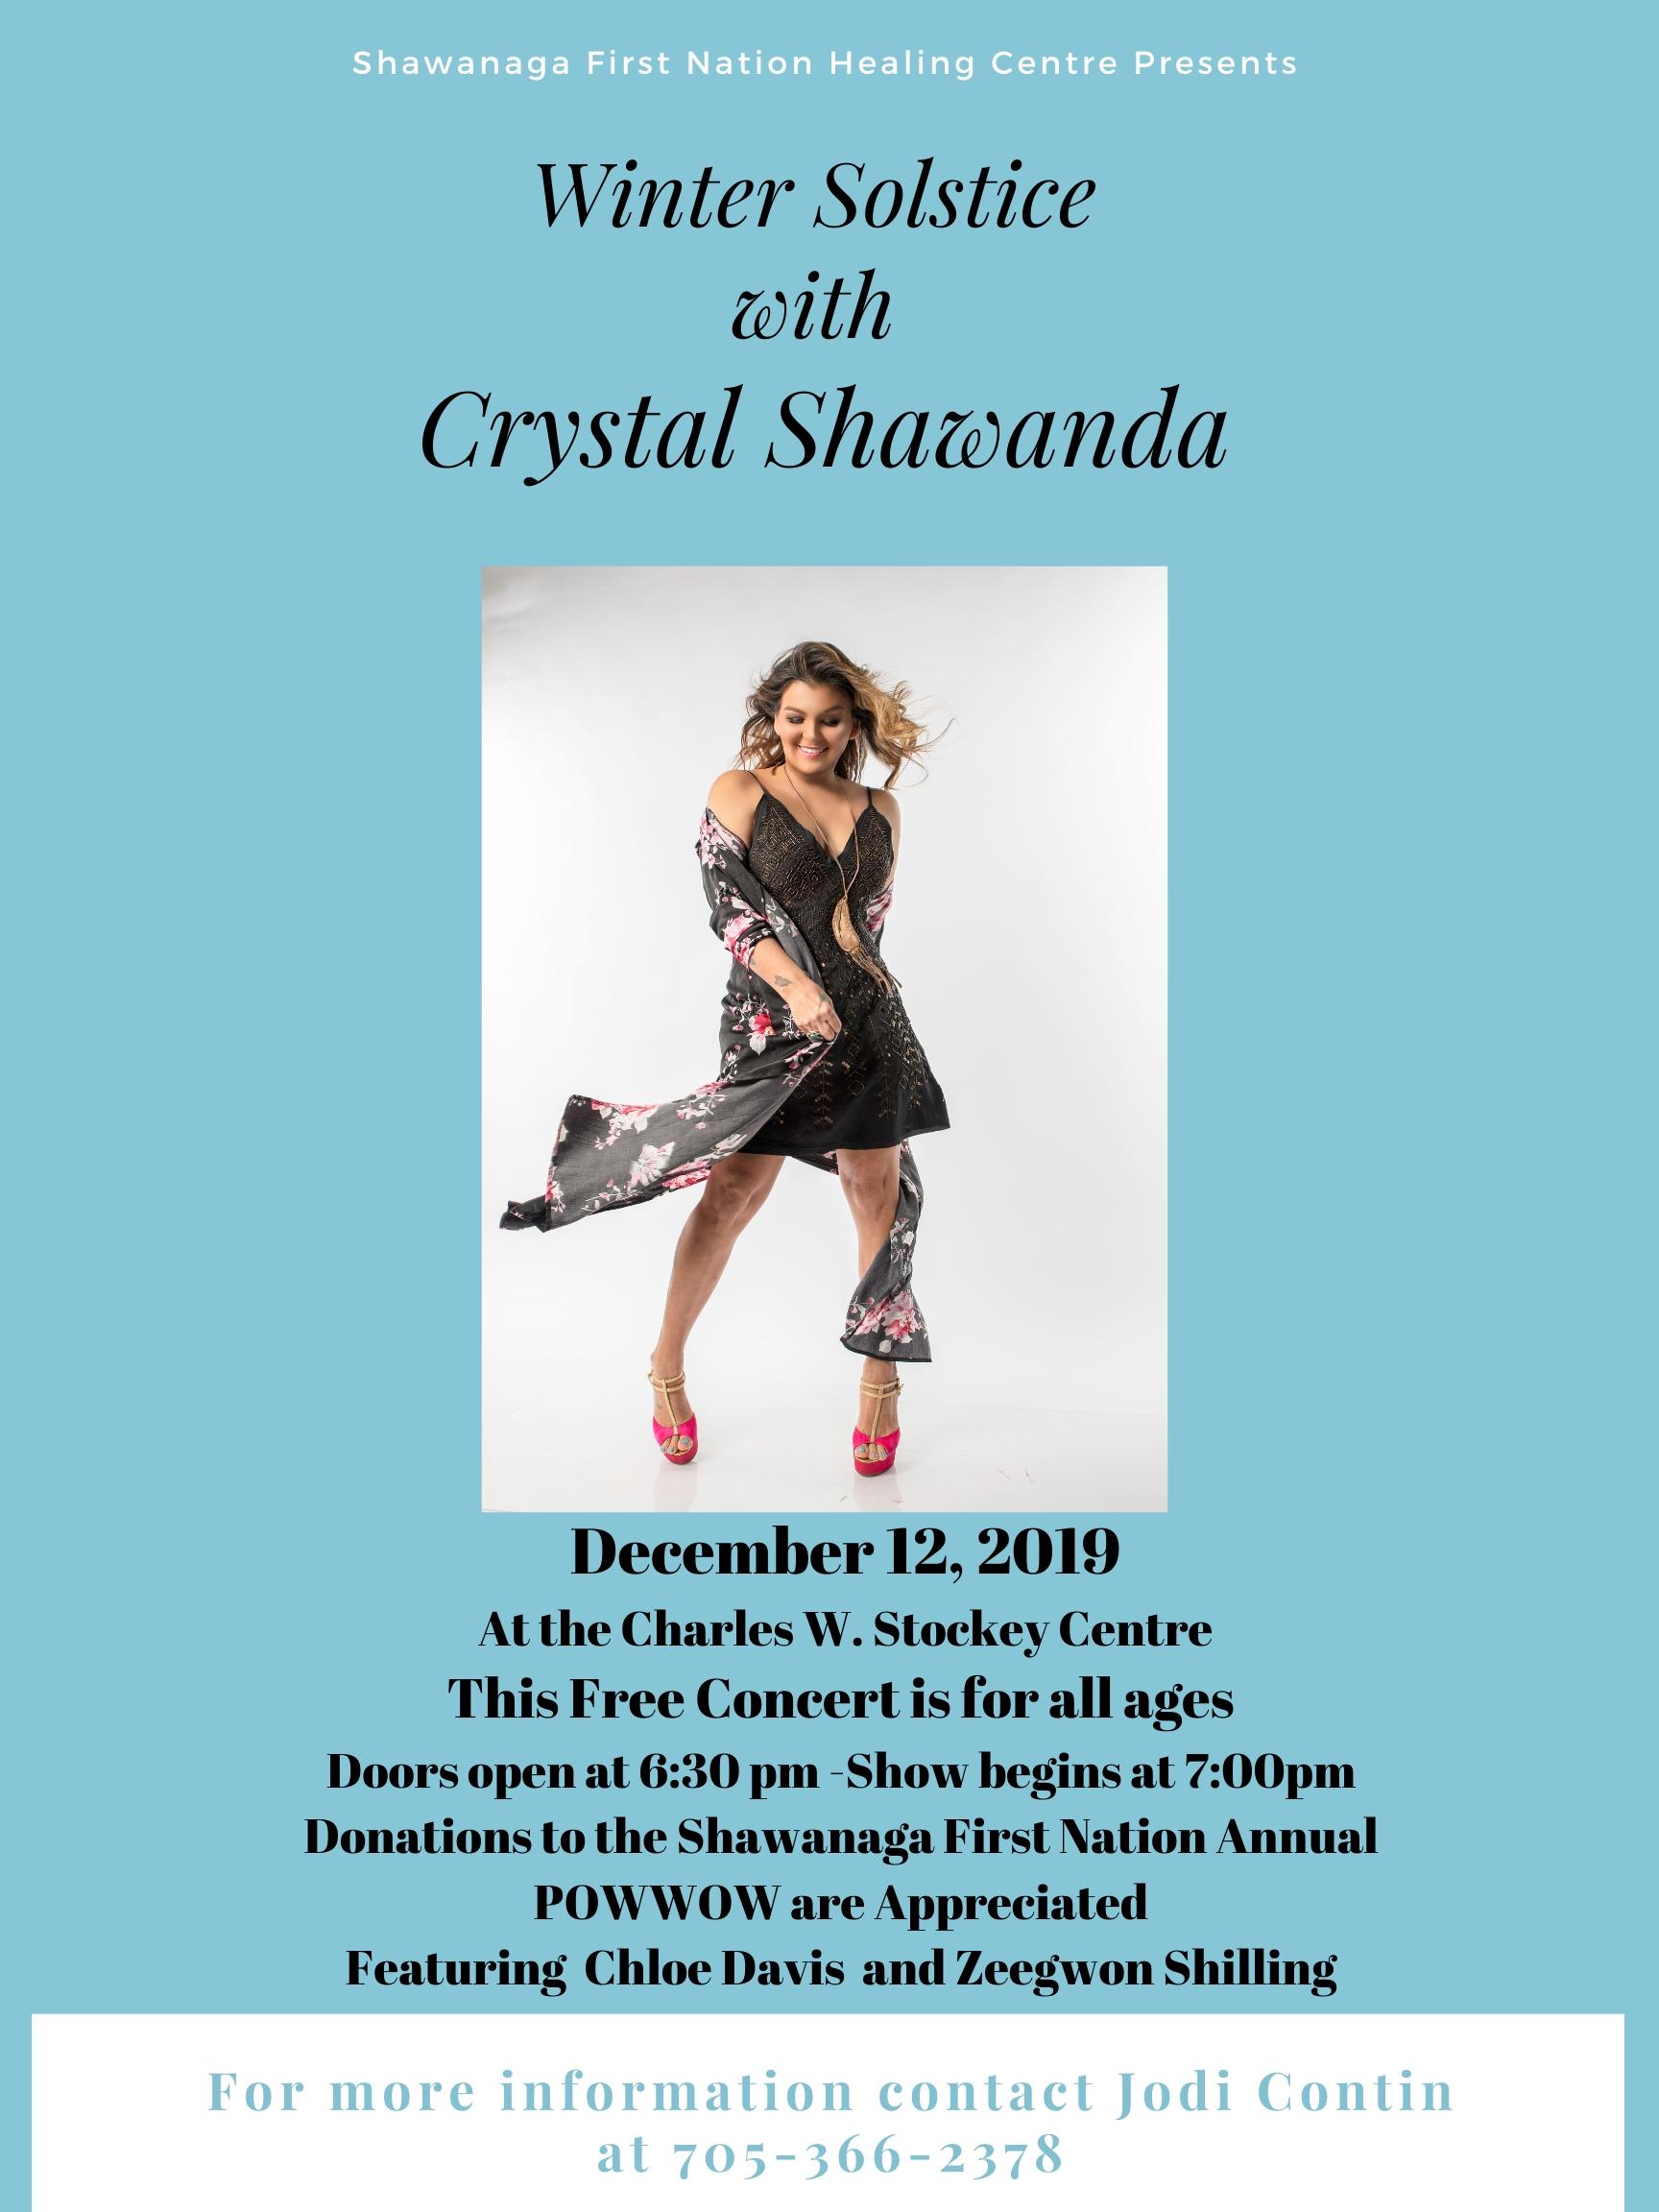 Crystal Shawanda Concert Image